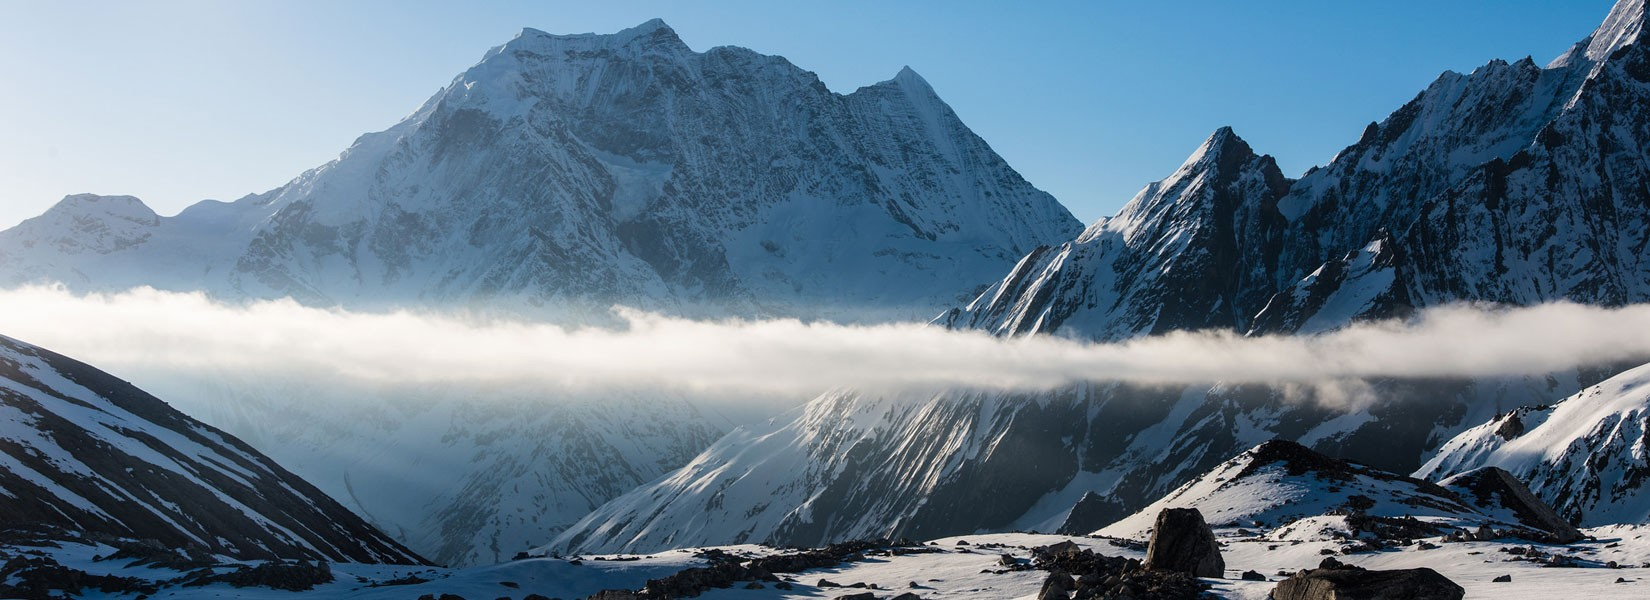 trekking-in-nepal-himalaya.jpg